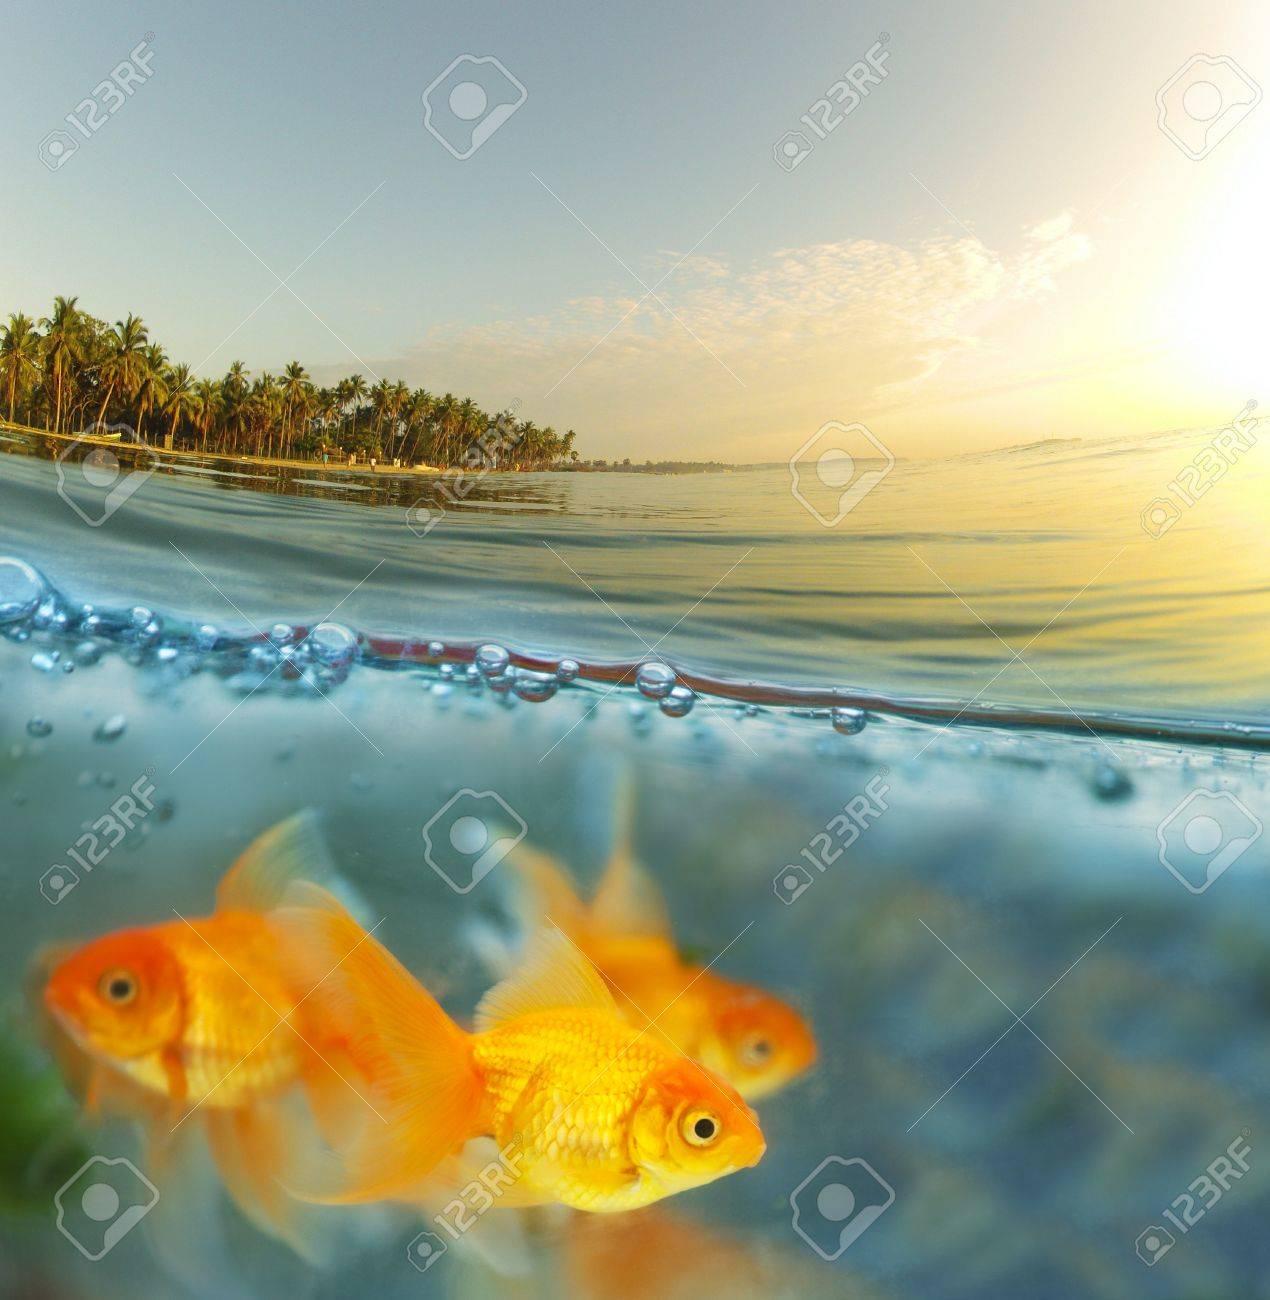 tropical fish Stock Photo - 16948889